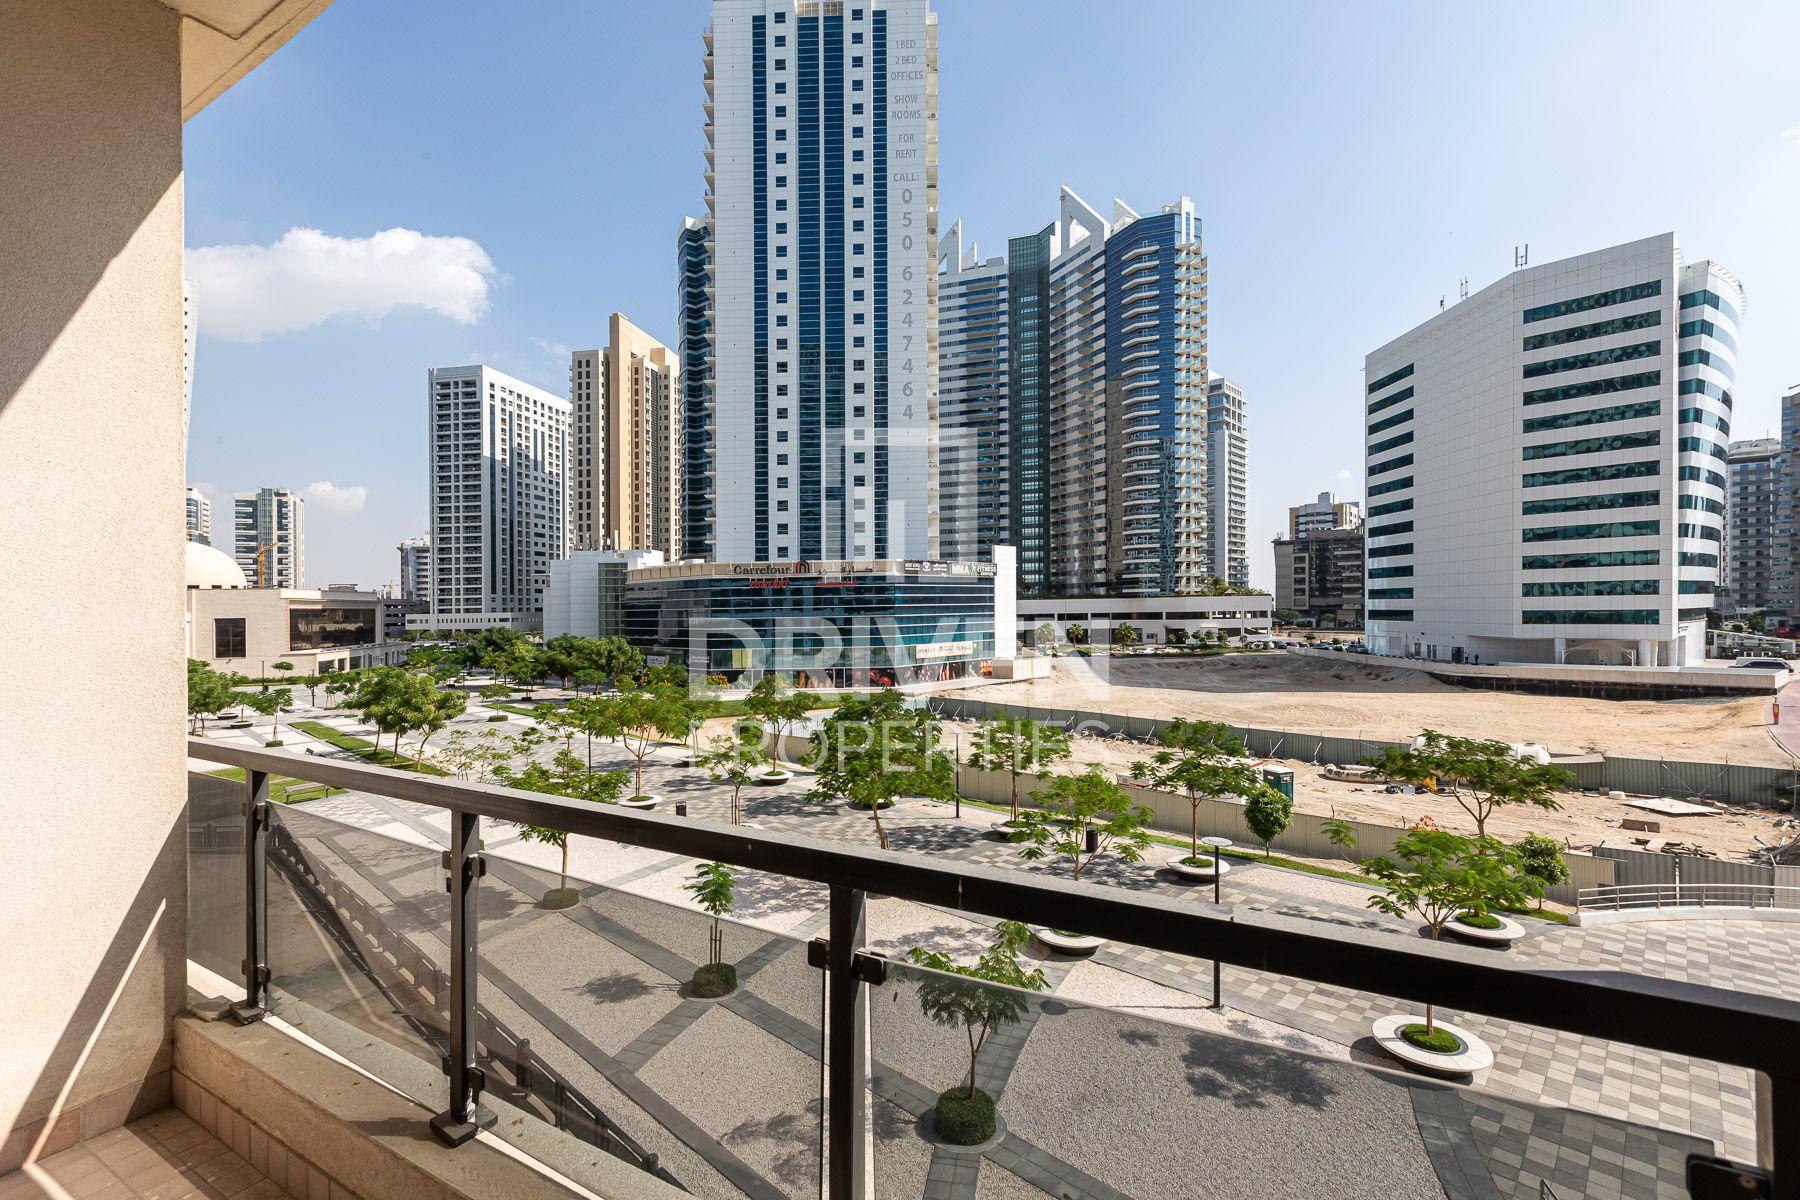 Apartment for Rent in API TECOM Residency - Barsha Heights (Tecom)